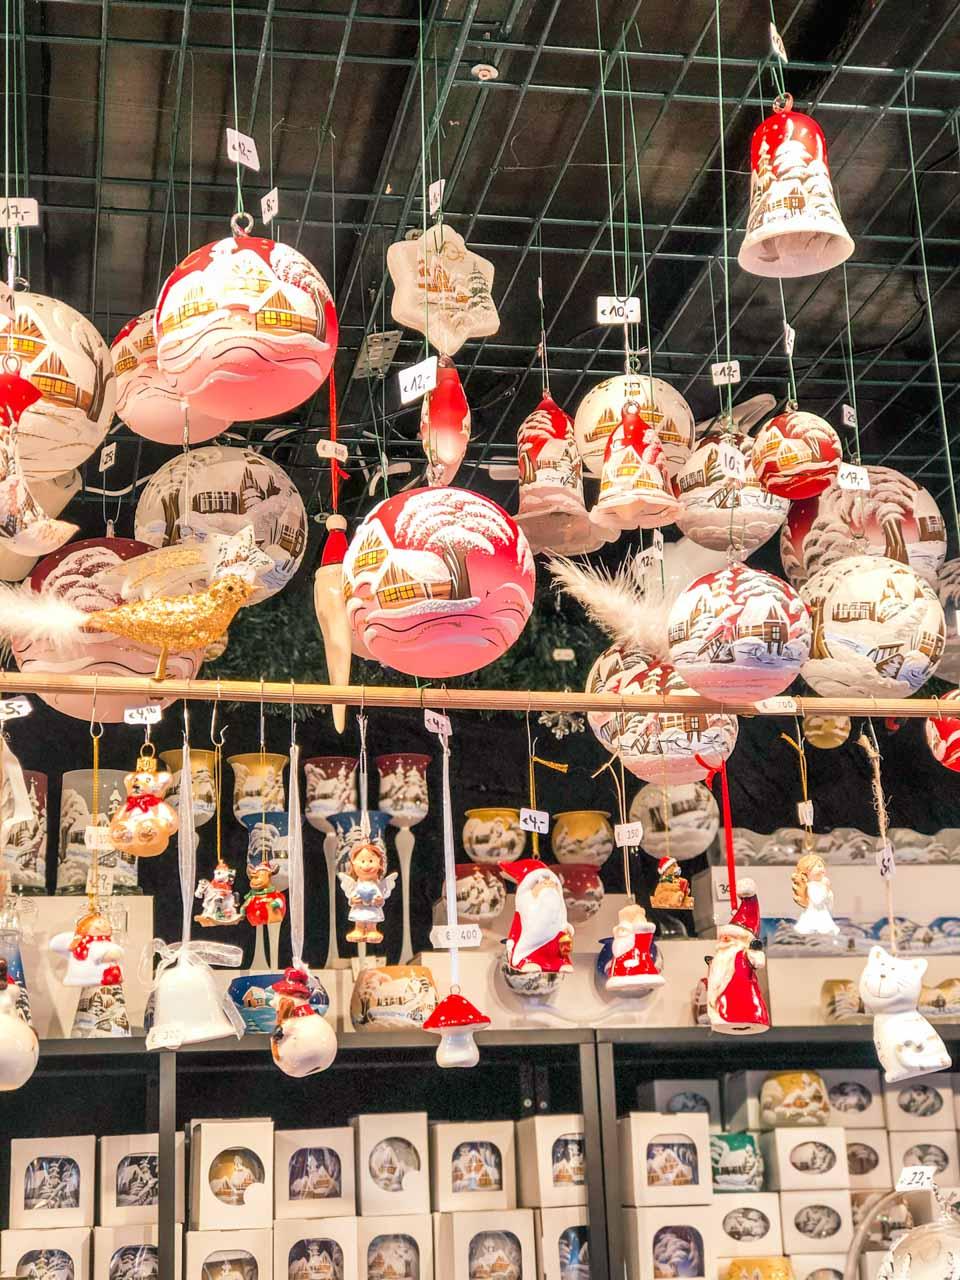 Handmade Christmas decorations and baubles at a Hamburg Christmas market